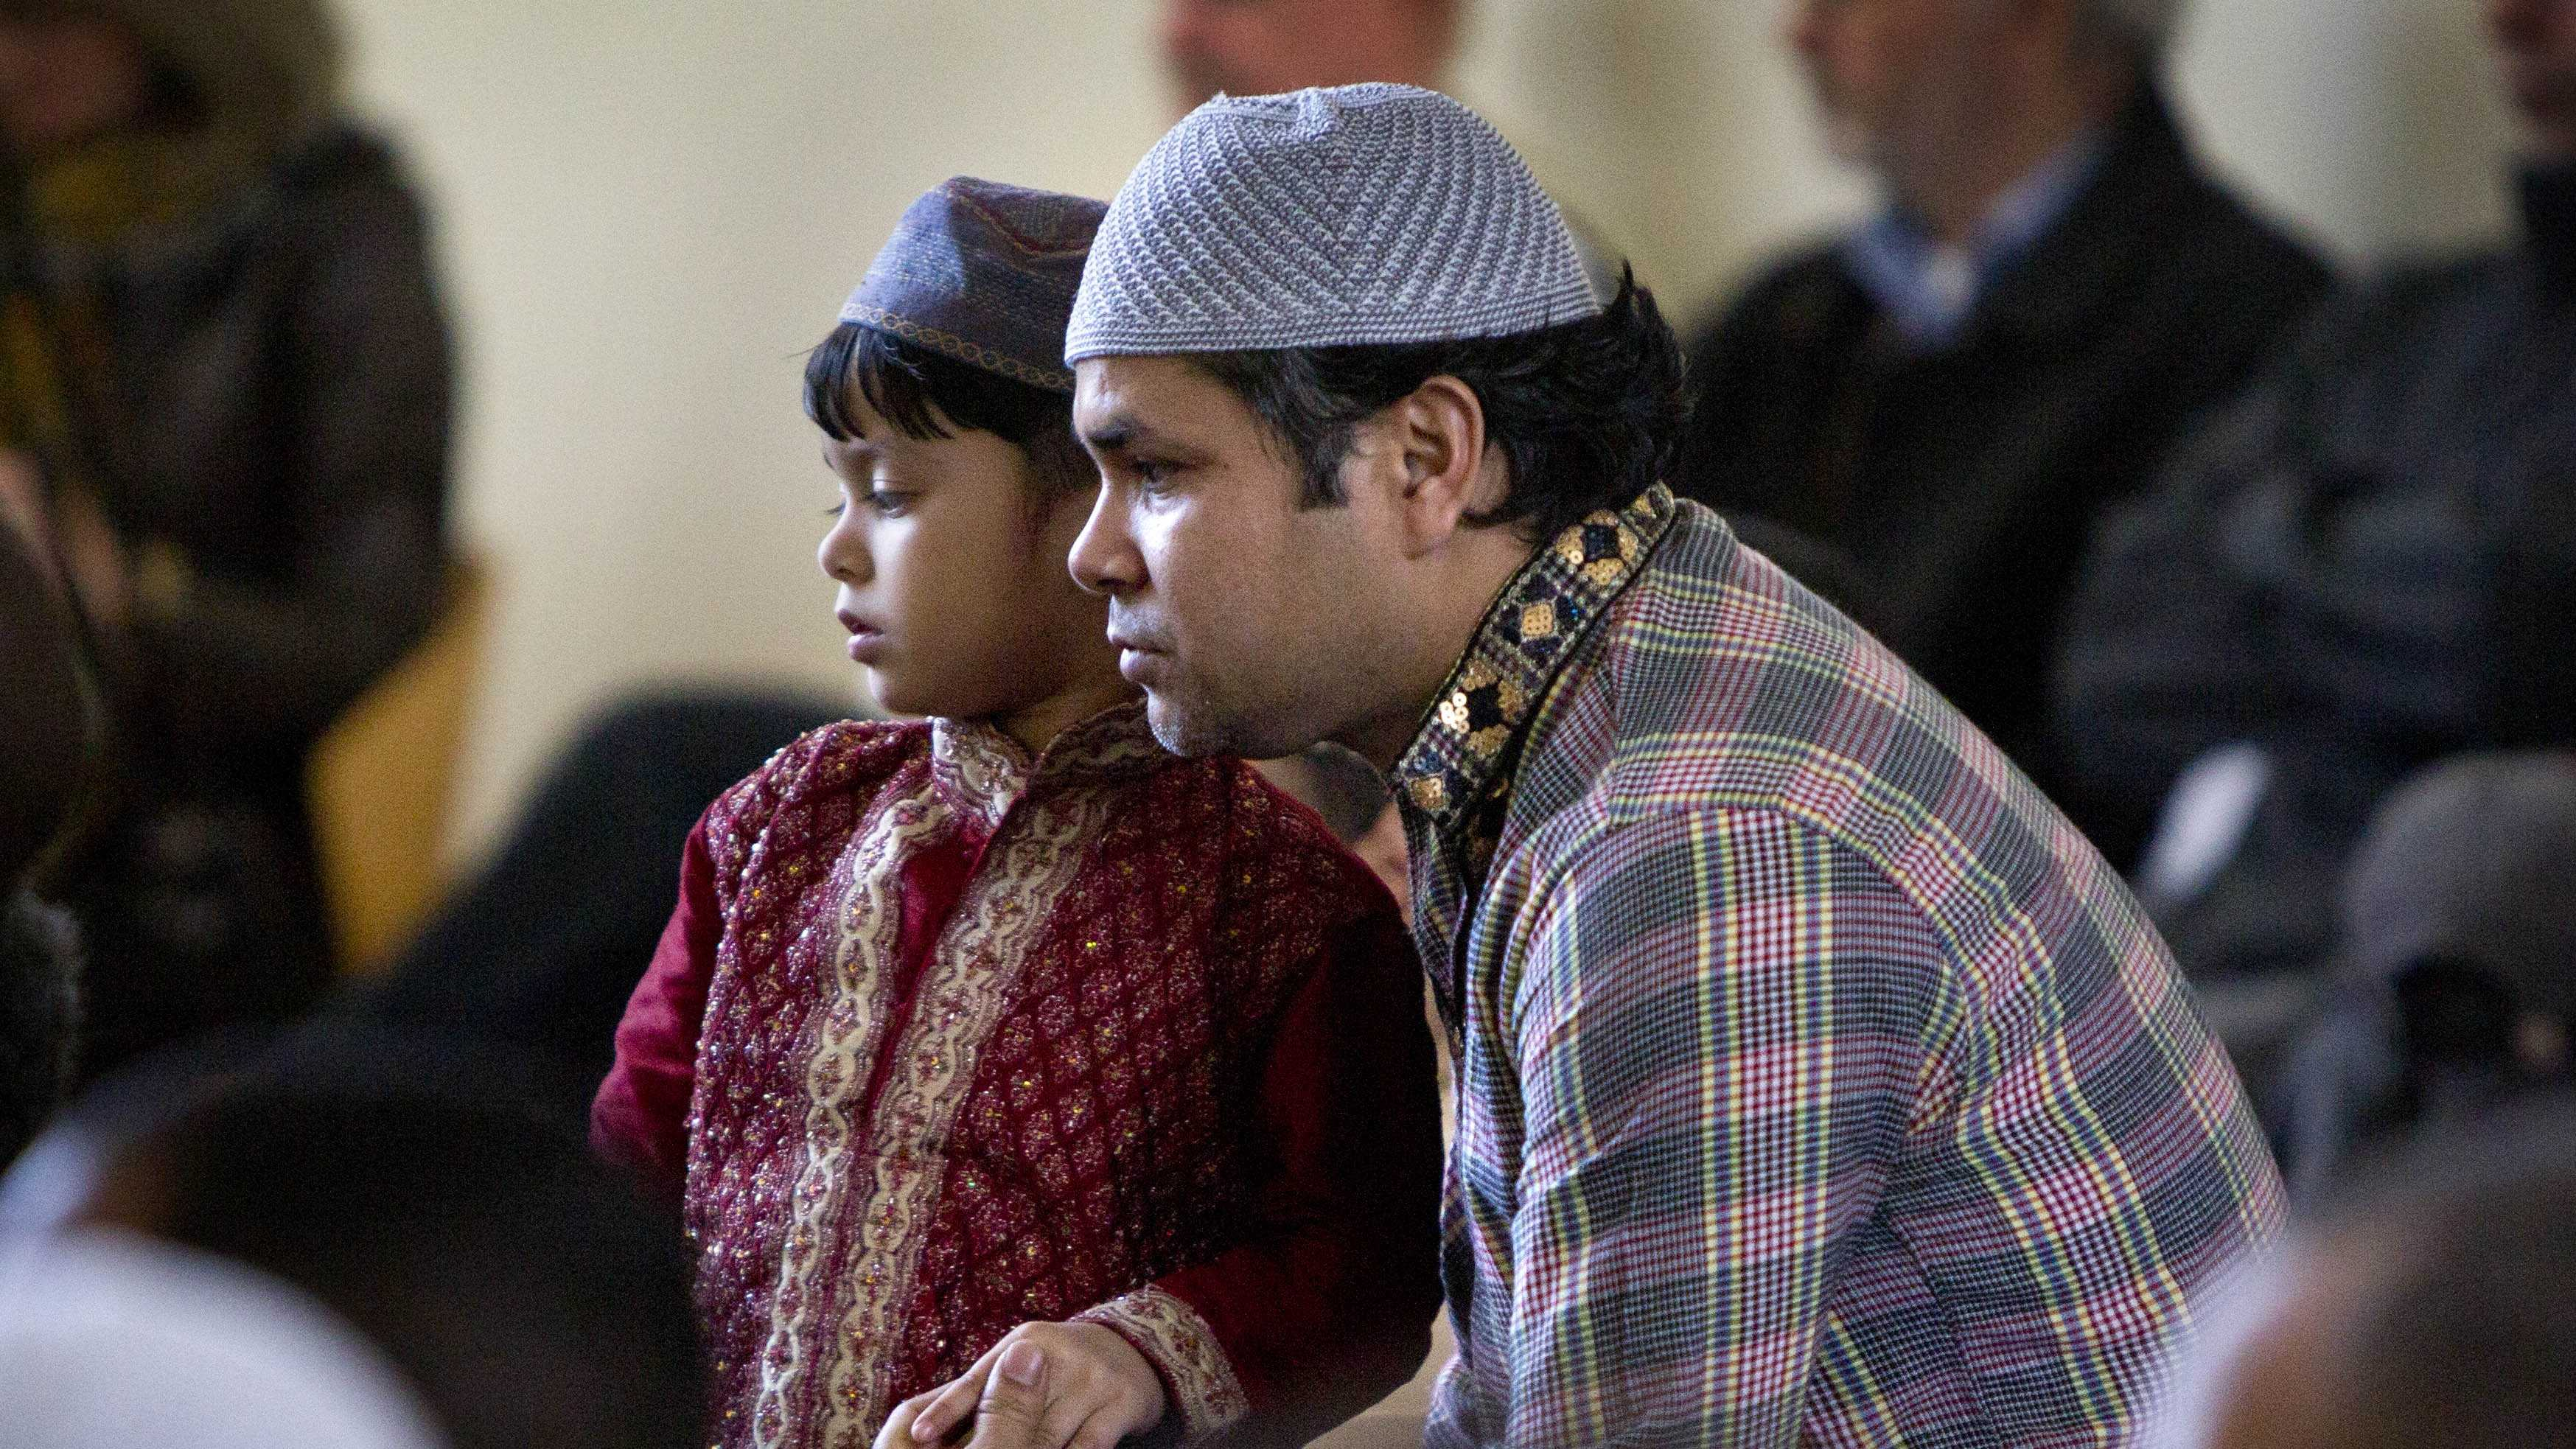 Islamic Society of Boston Prayer Service